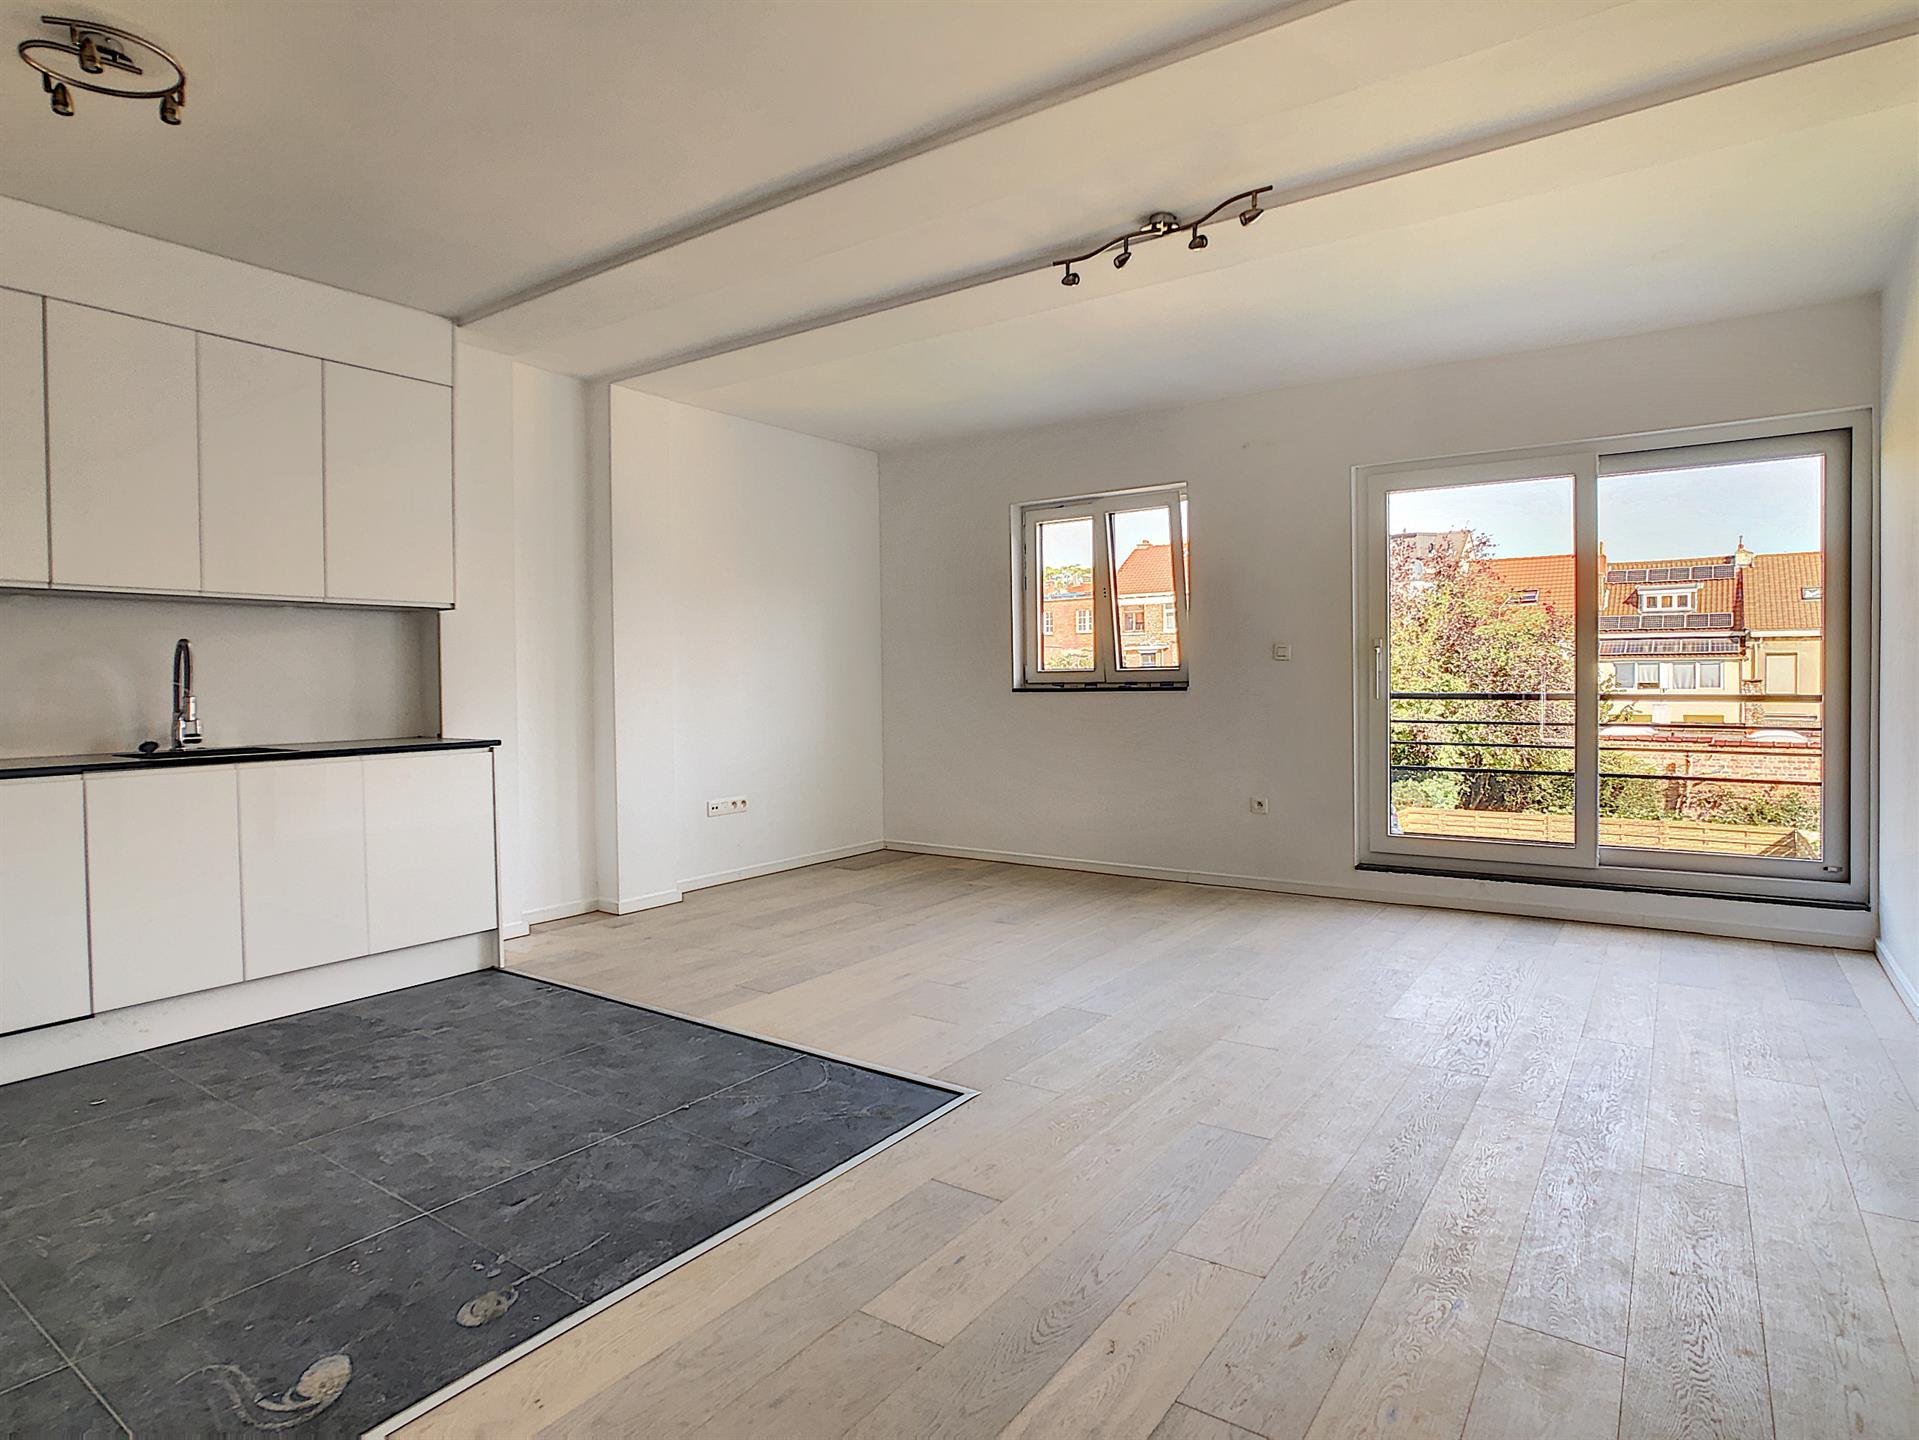 Appartement - Anderlecht - #4252375-21